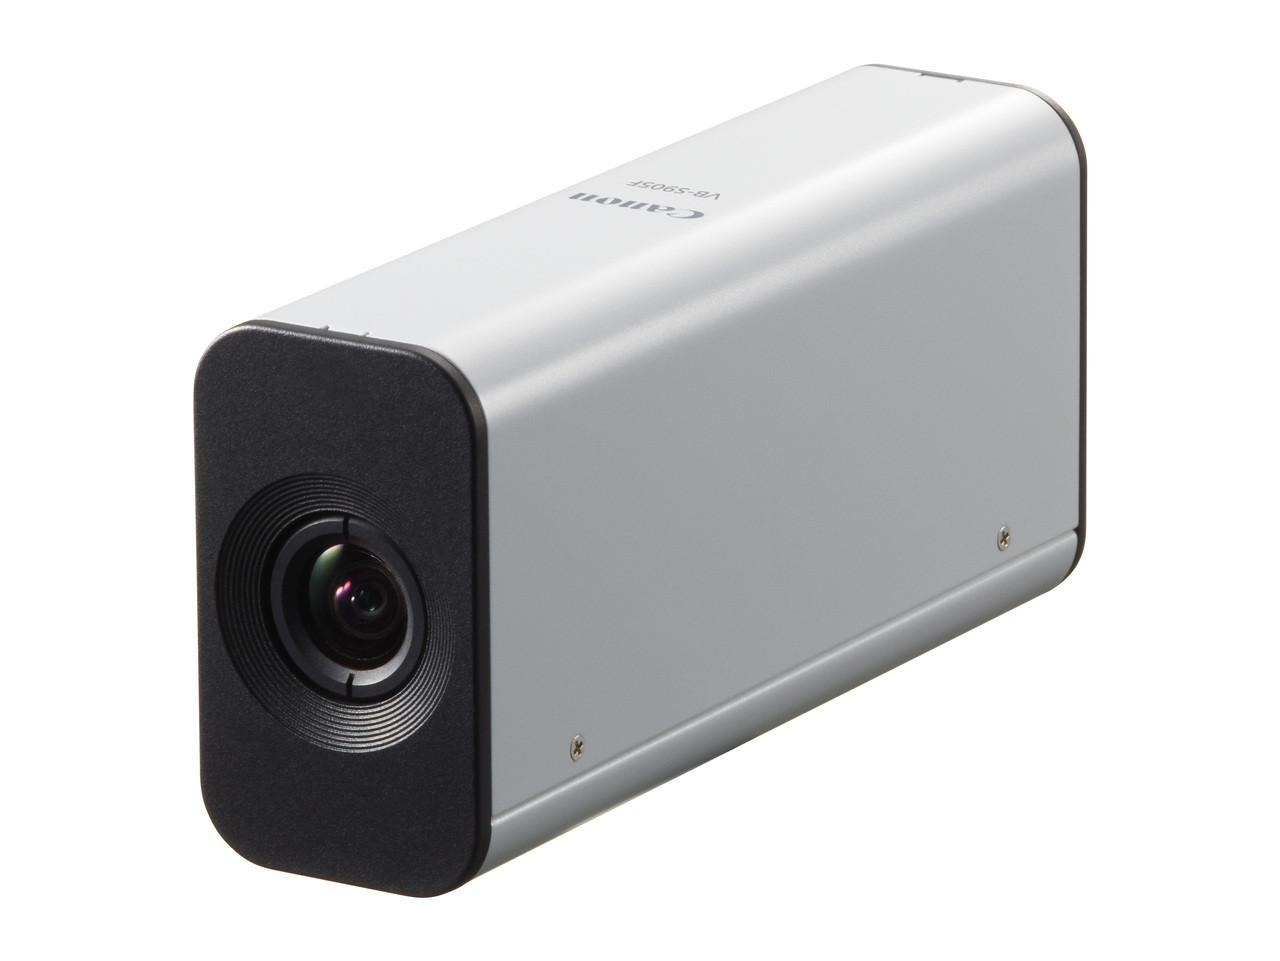 Canon 1.3MP Compact Fixed Network Camera, VB-S905F, 9901B001